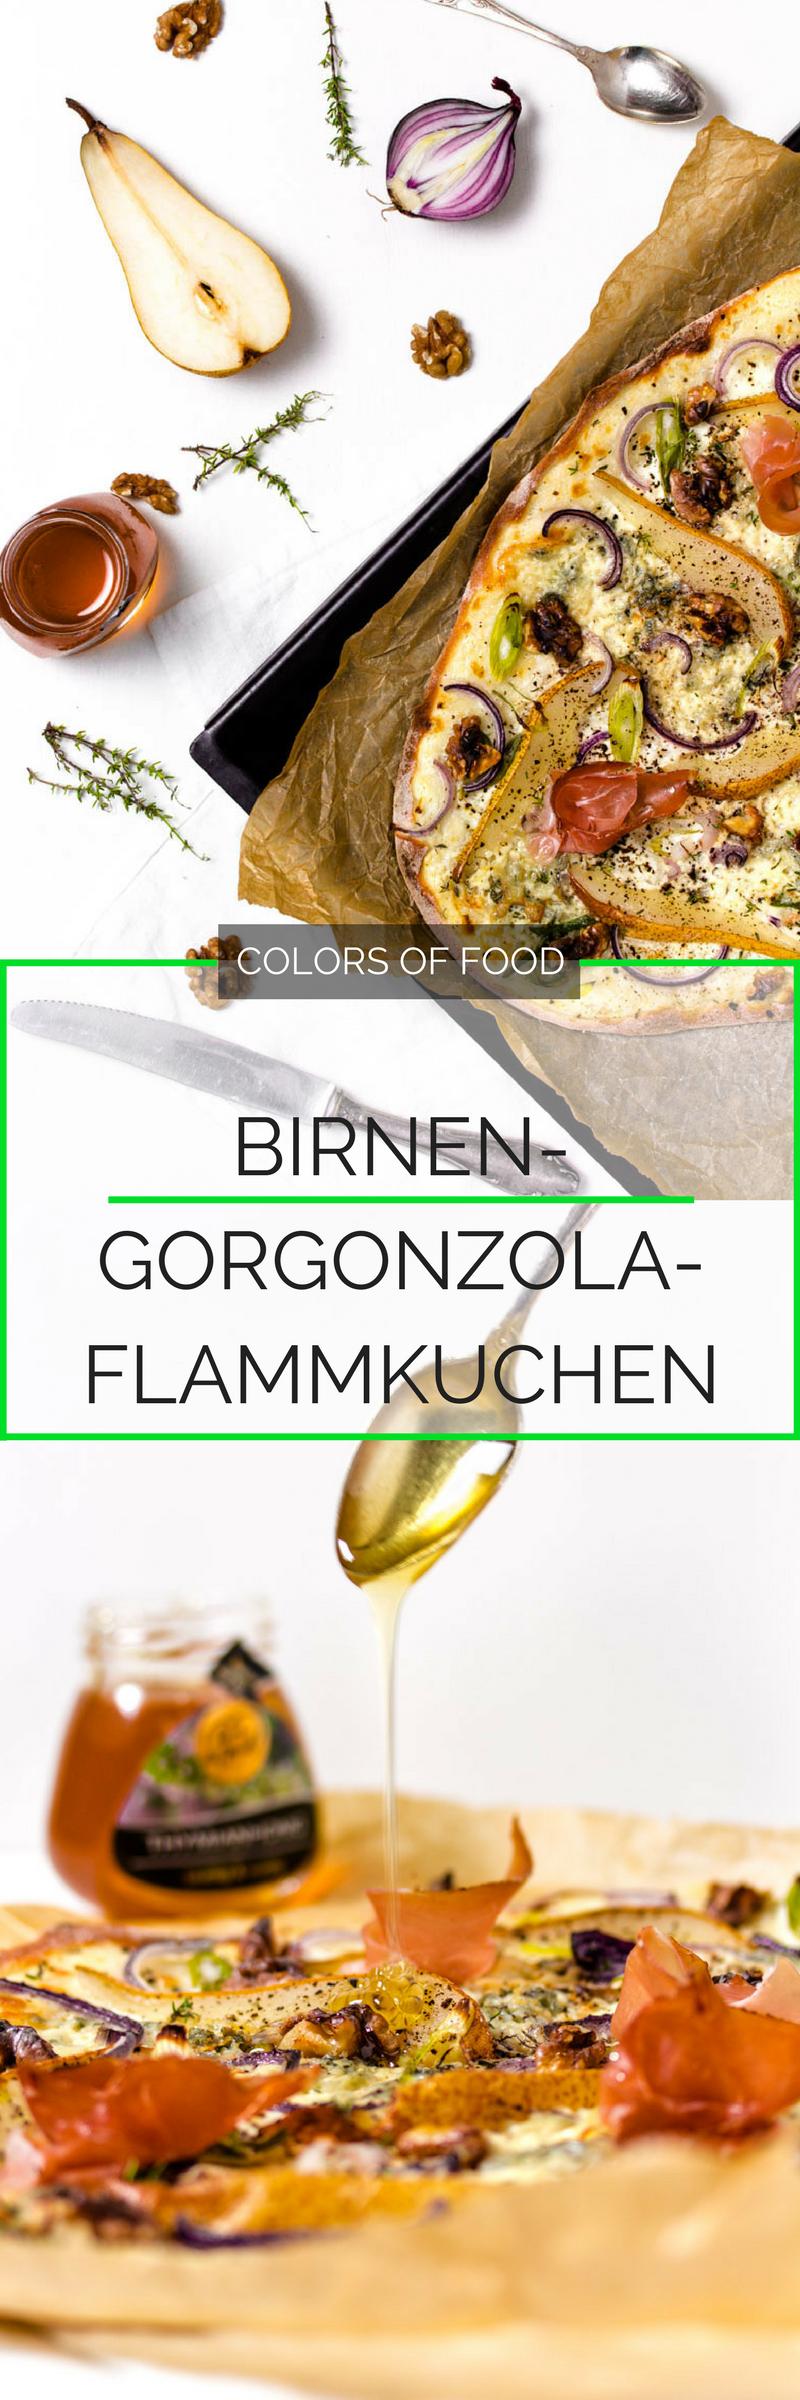 birnen gorgonzola flammkuchen rezept recipes food pinterest flammkuchen flammkuchen. Black Bedroom Furniture Sets. Home Design Ideas